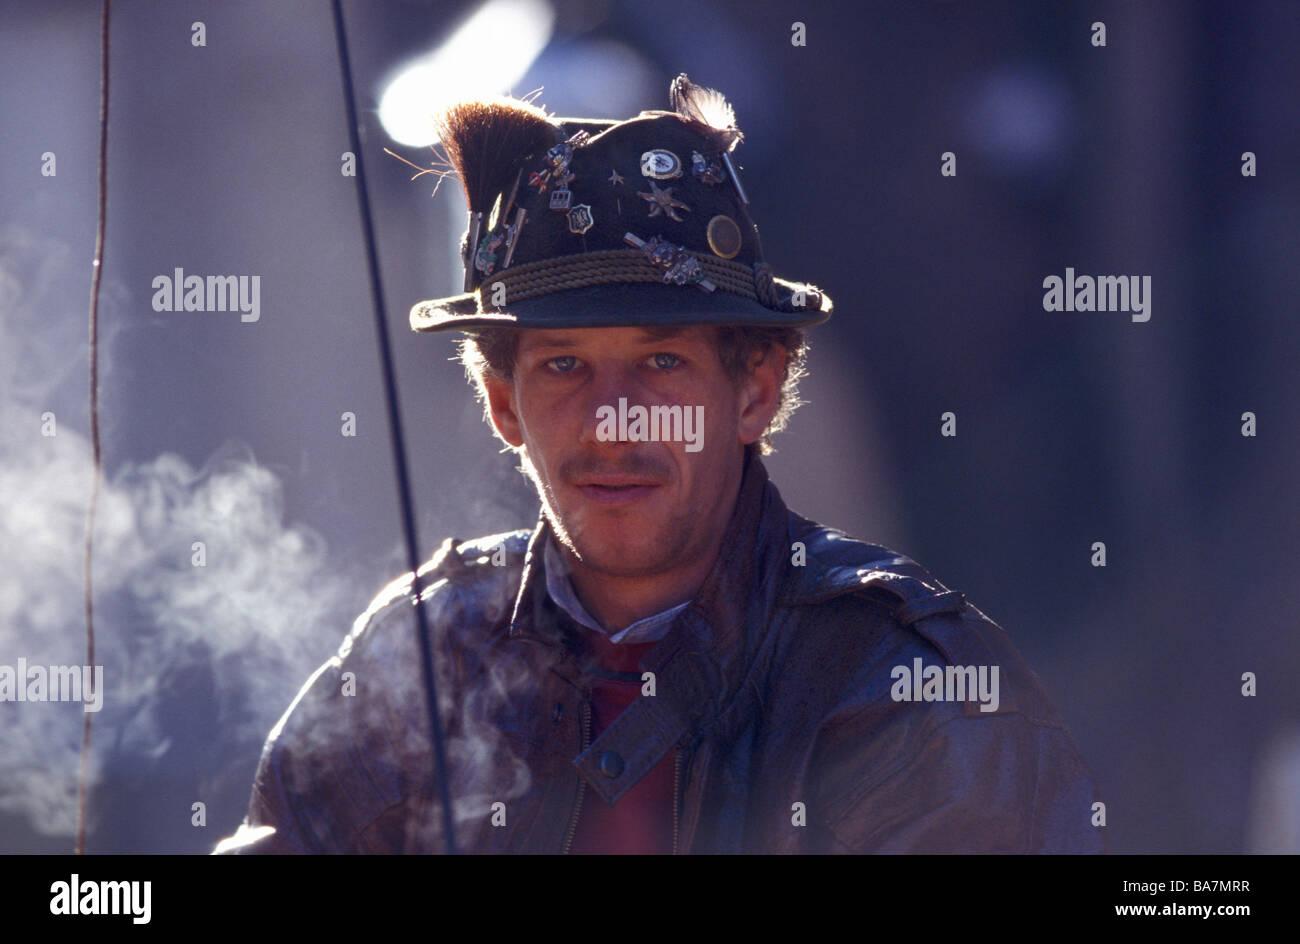 Portrait of a coachman, Kitzbuhel, Tyrol, Austria - Stock Image